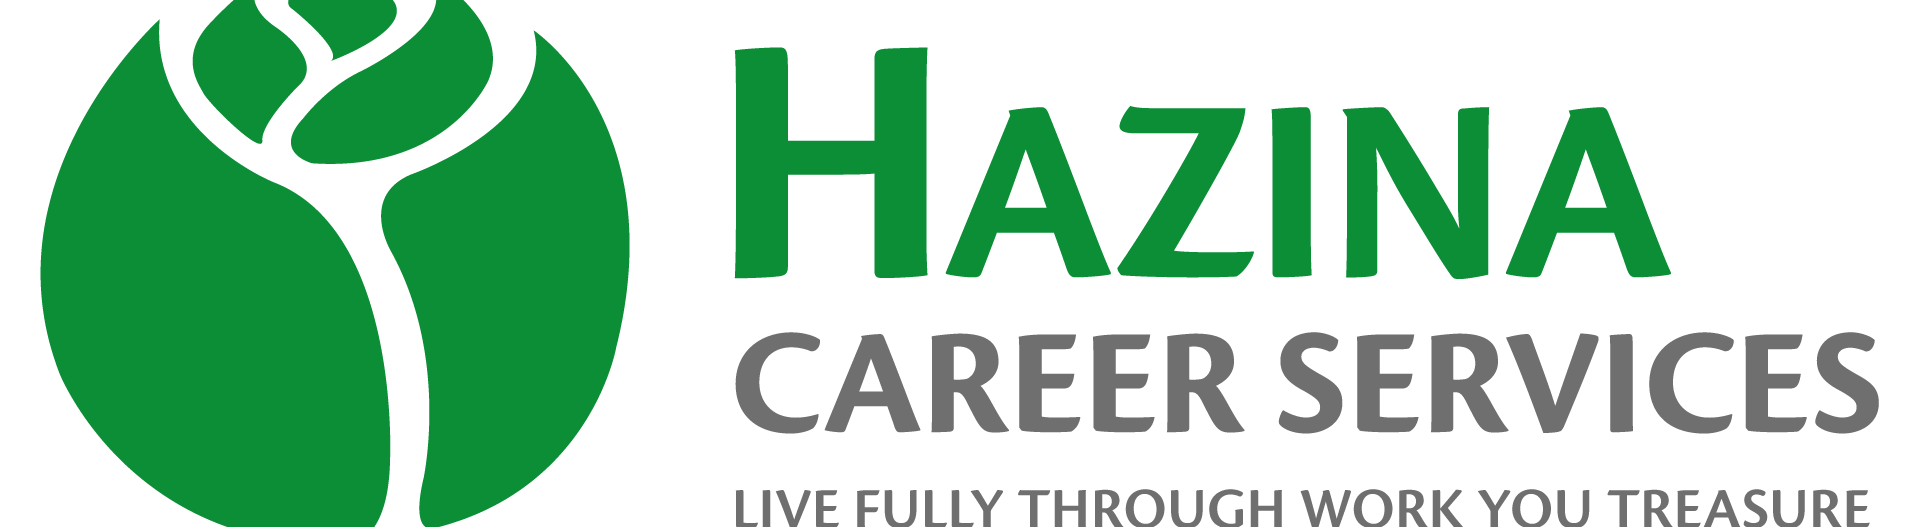 Hazina Career Services